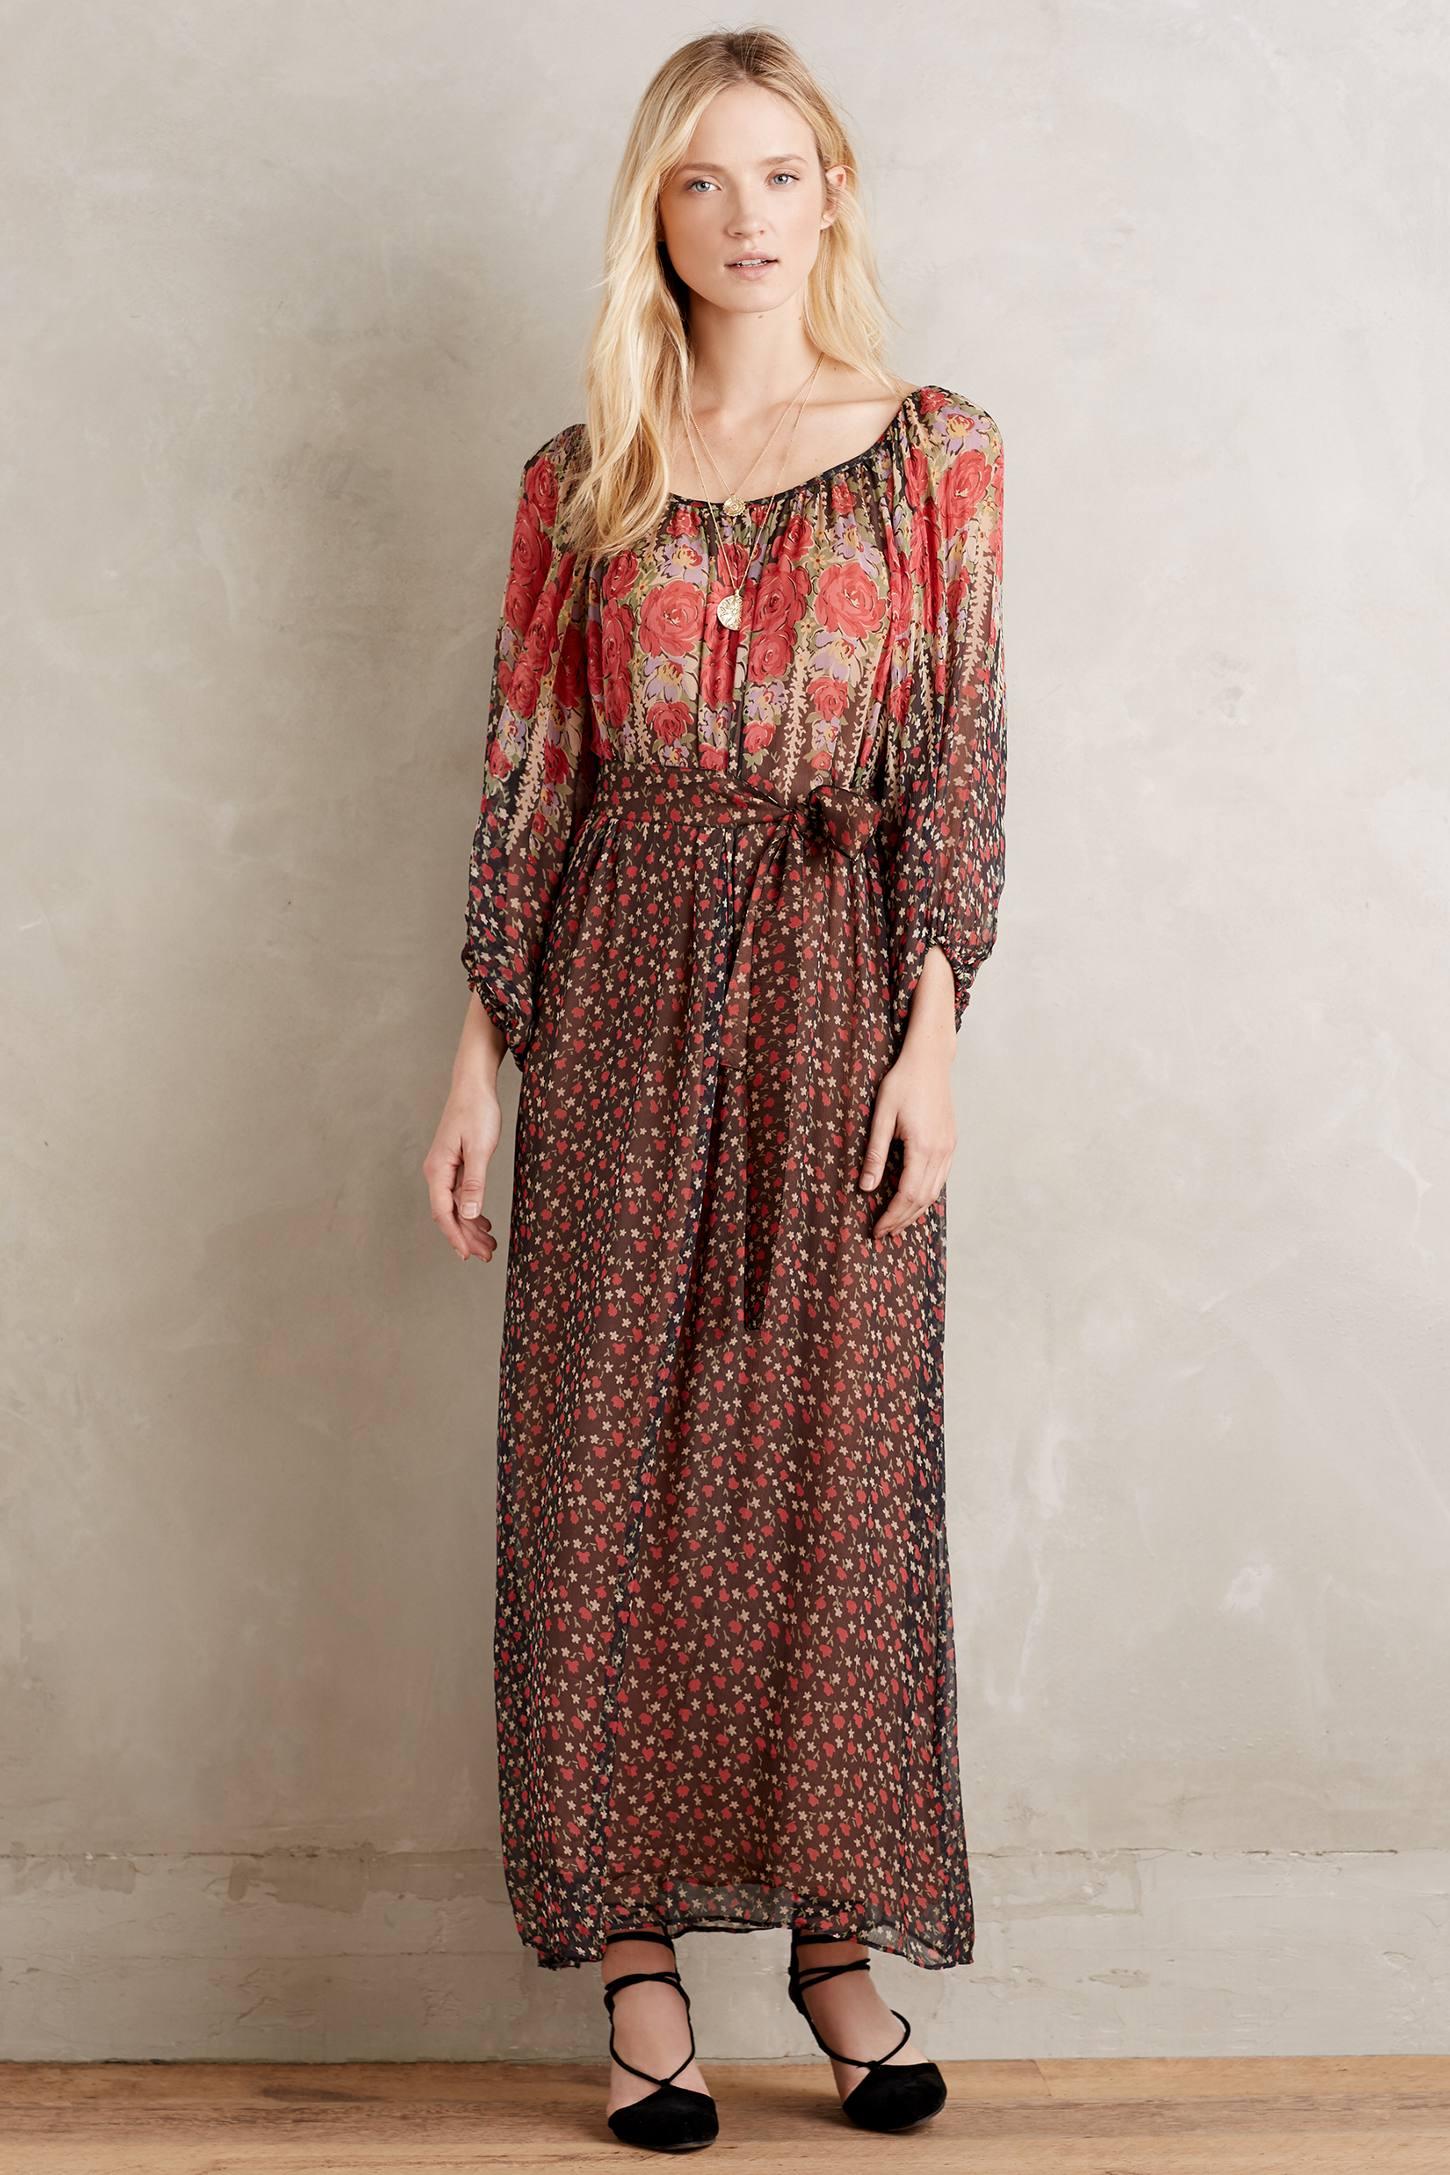 4d770fd35c912 Anthropologie's New Arrivals: Fall Dresses & Skirts - Topista